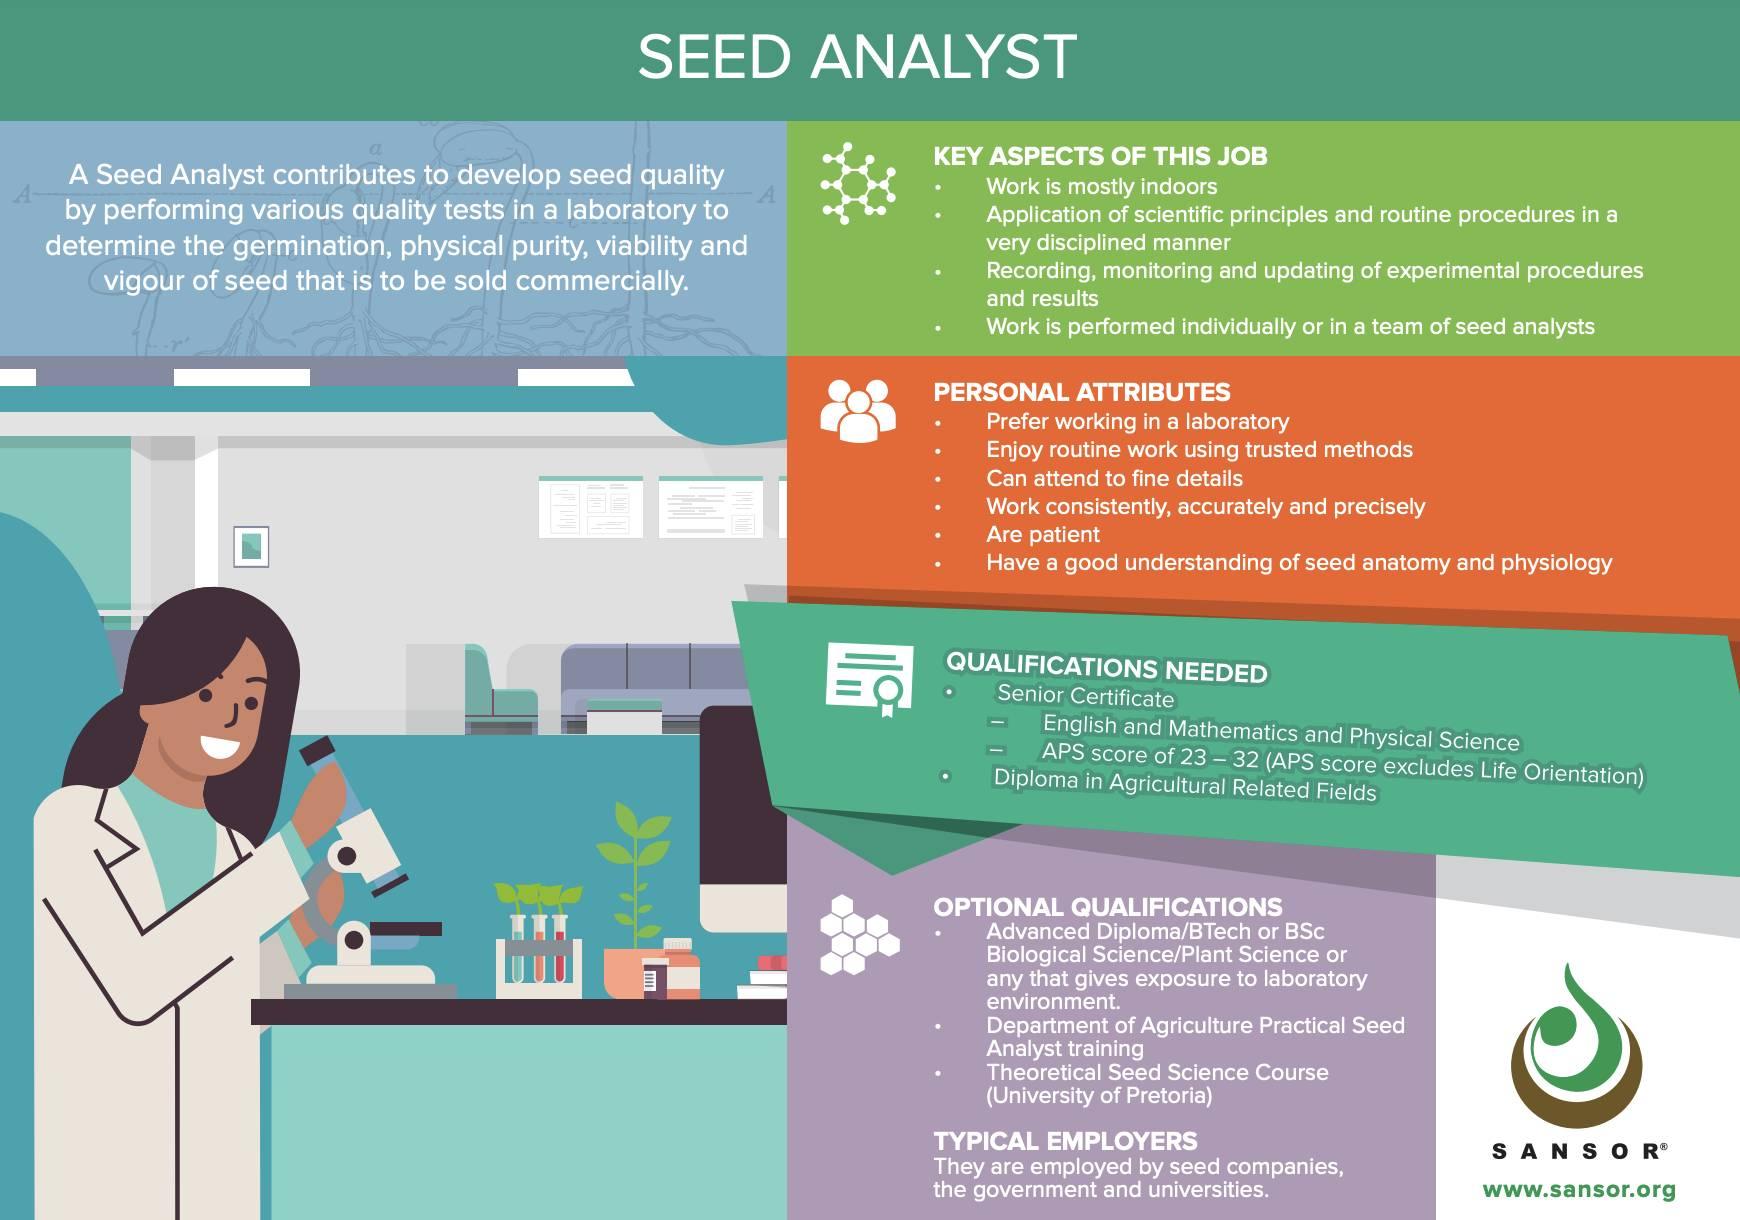 SANSOR - Seed Analyst